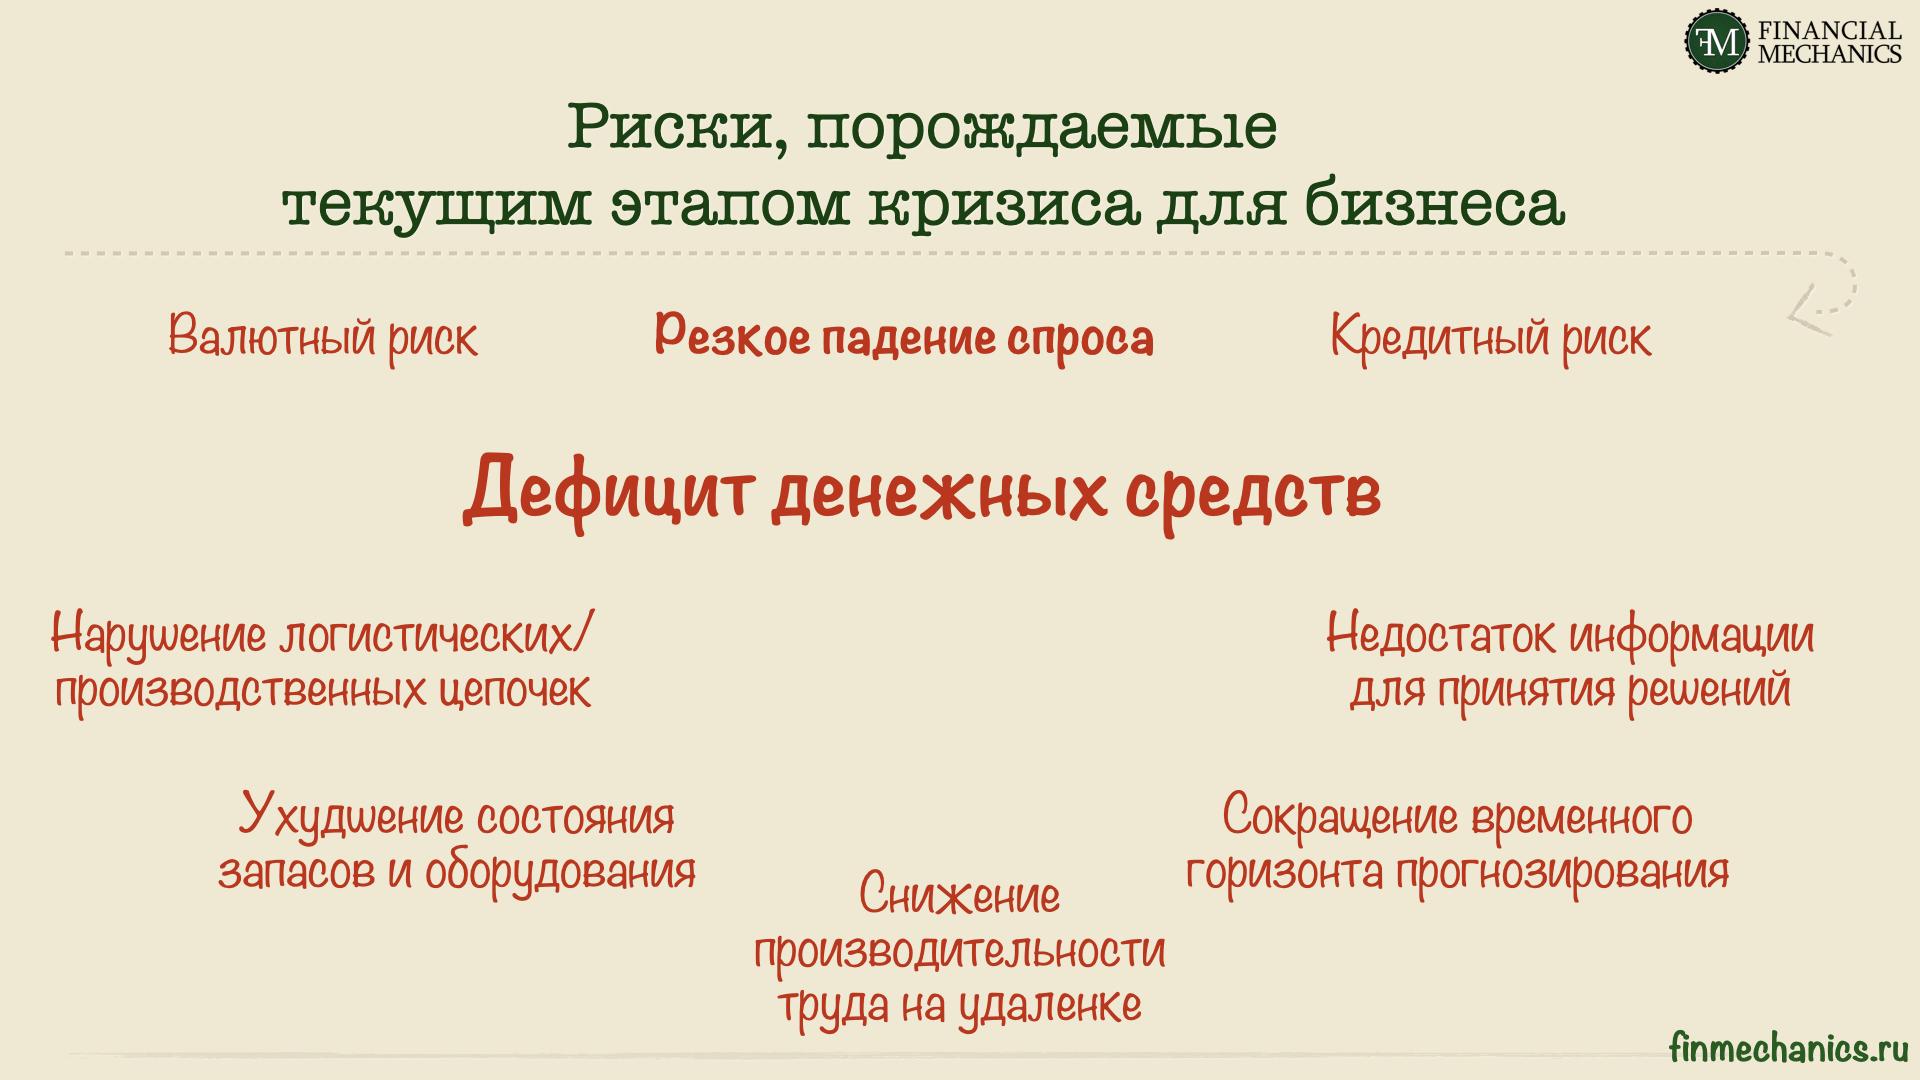 ACCA_2020_07_04_V2.005